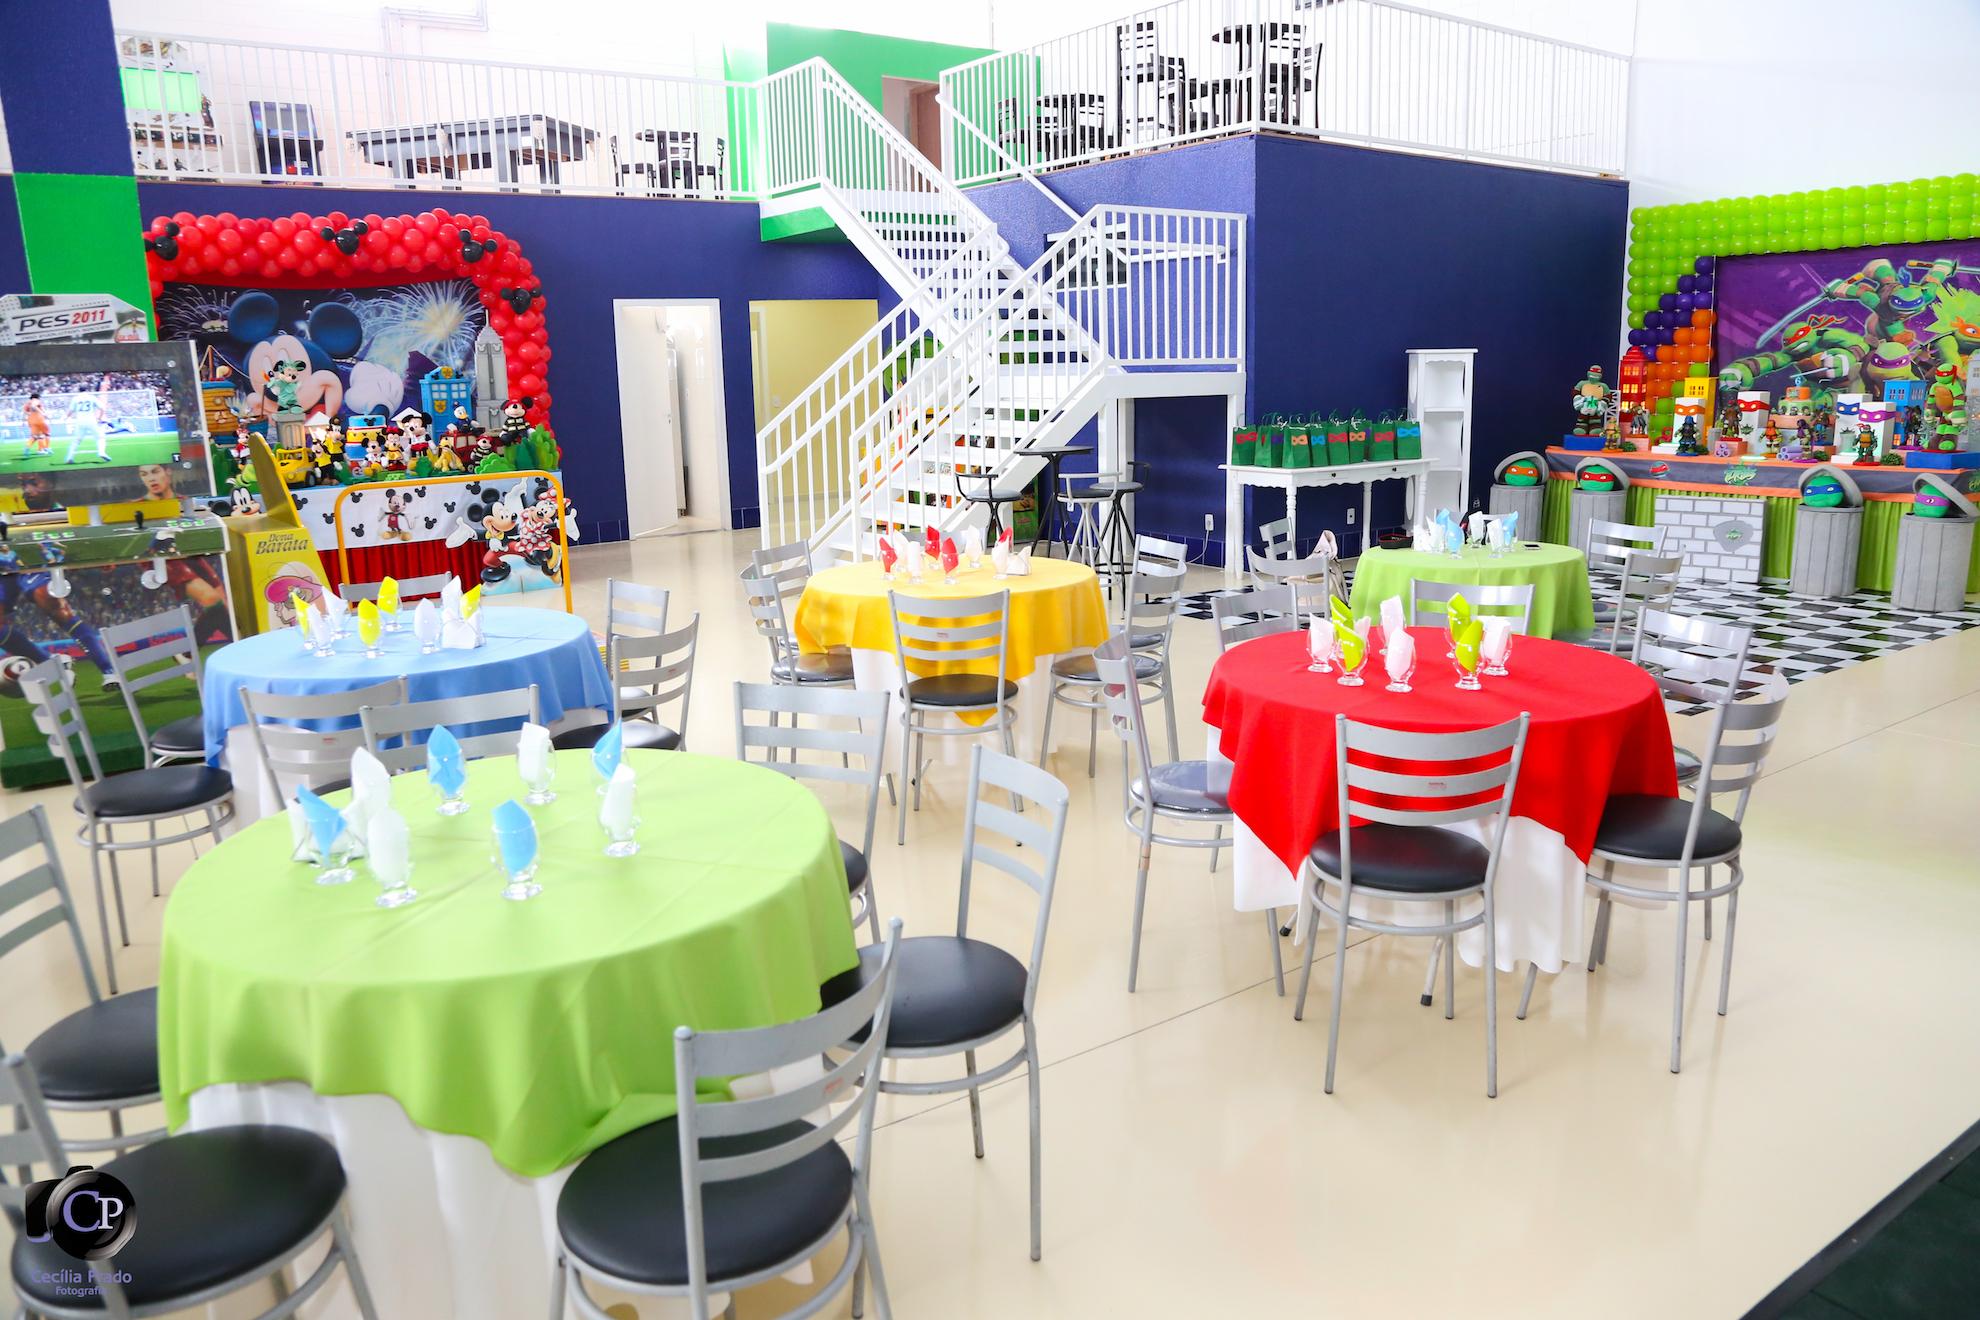 Stupendous Cantinho Da Folia Buffet Infantil Download Free Architecture Designs Intelgarnamadebymaigaardcom